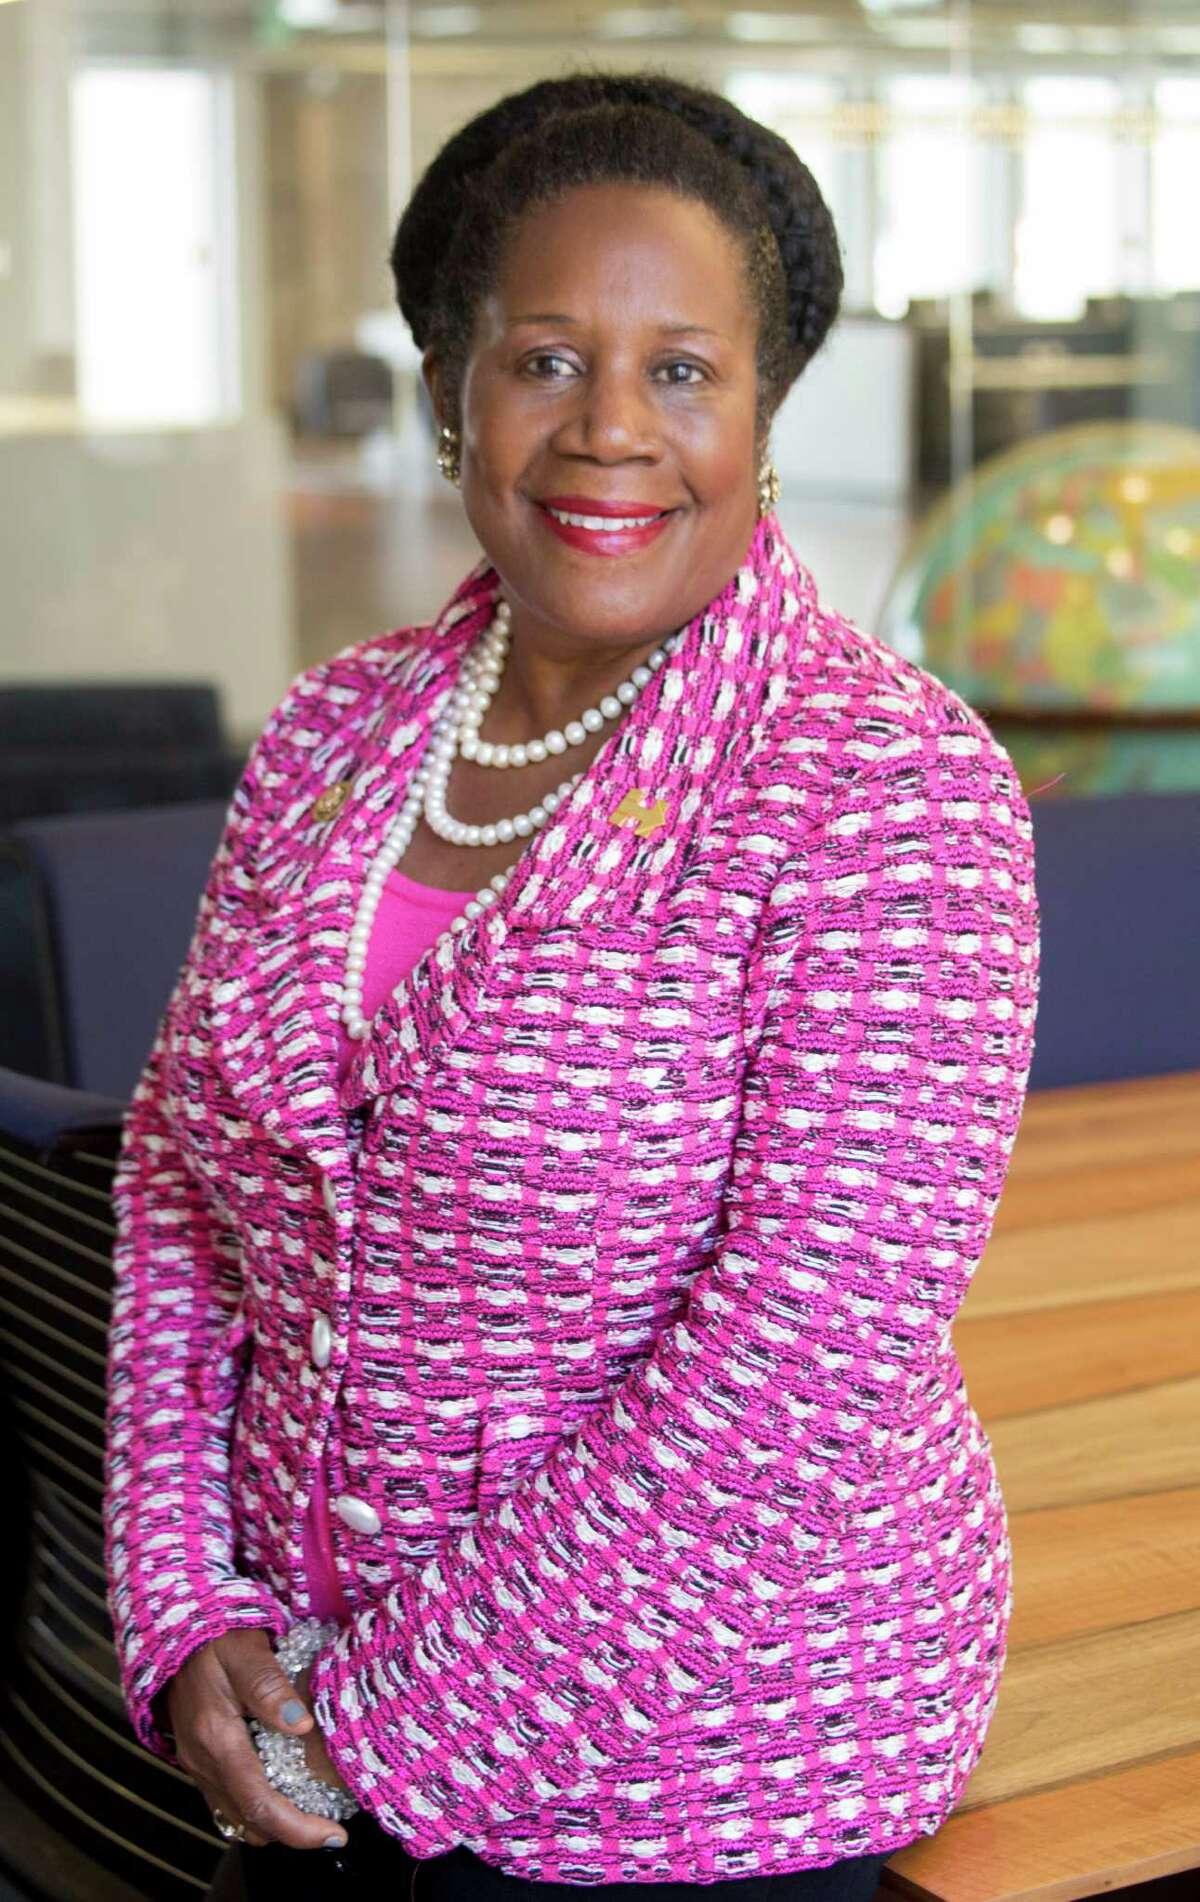 Sheila Jackson Lee is seeking re-election as U.S. representative to Texas' 18th Congressional District. (Photo: JeremyCarter/ Houston Chronicle)